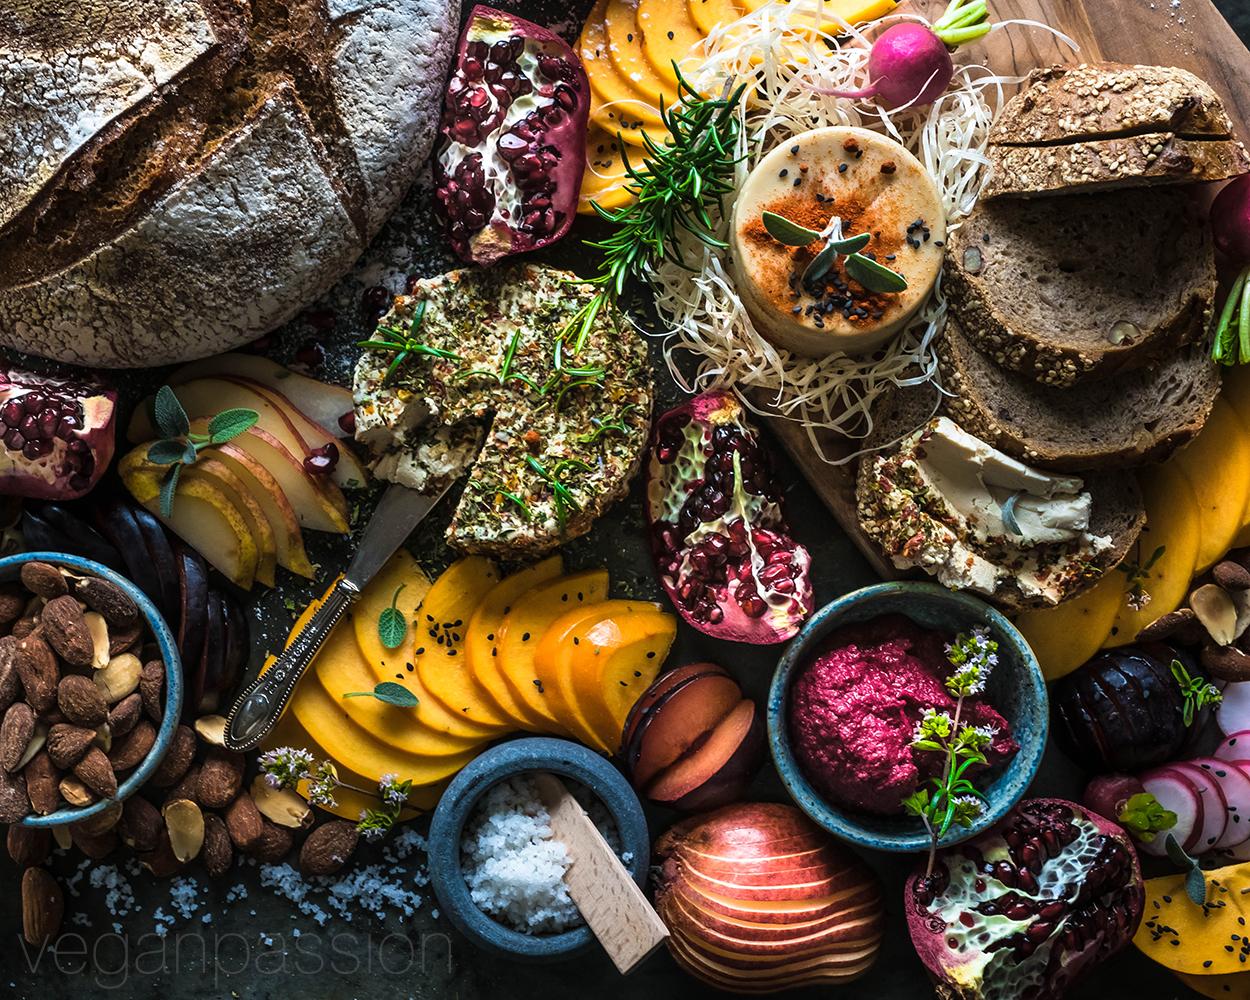 Die 11 besten Food-Fotografie Tipps